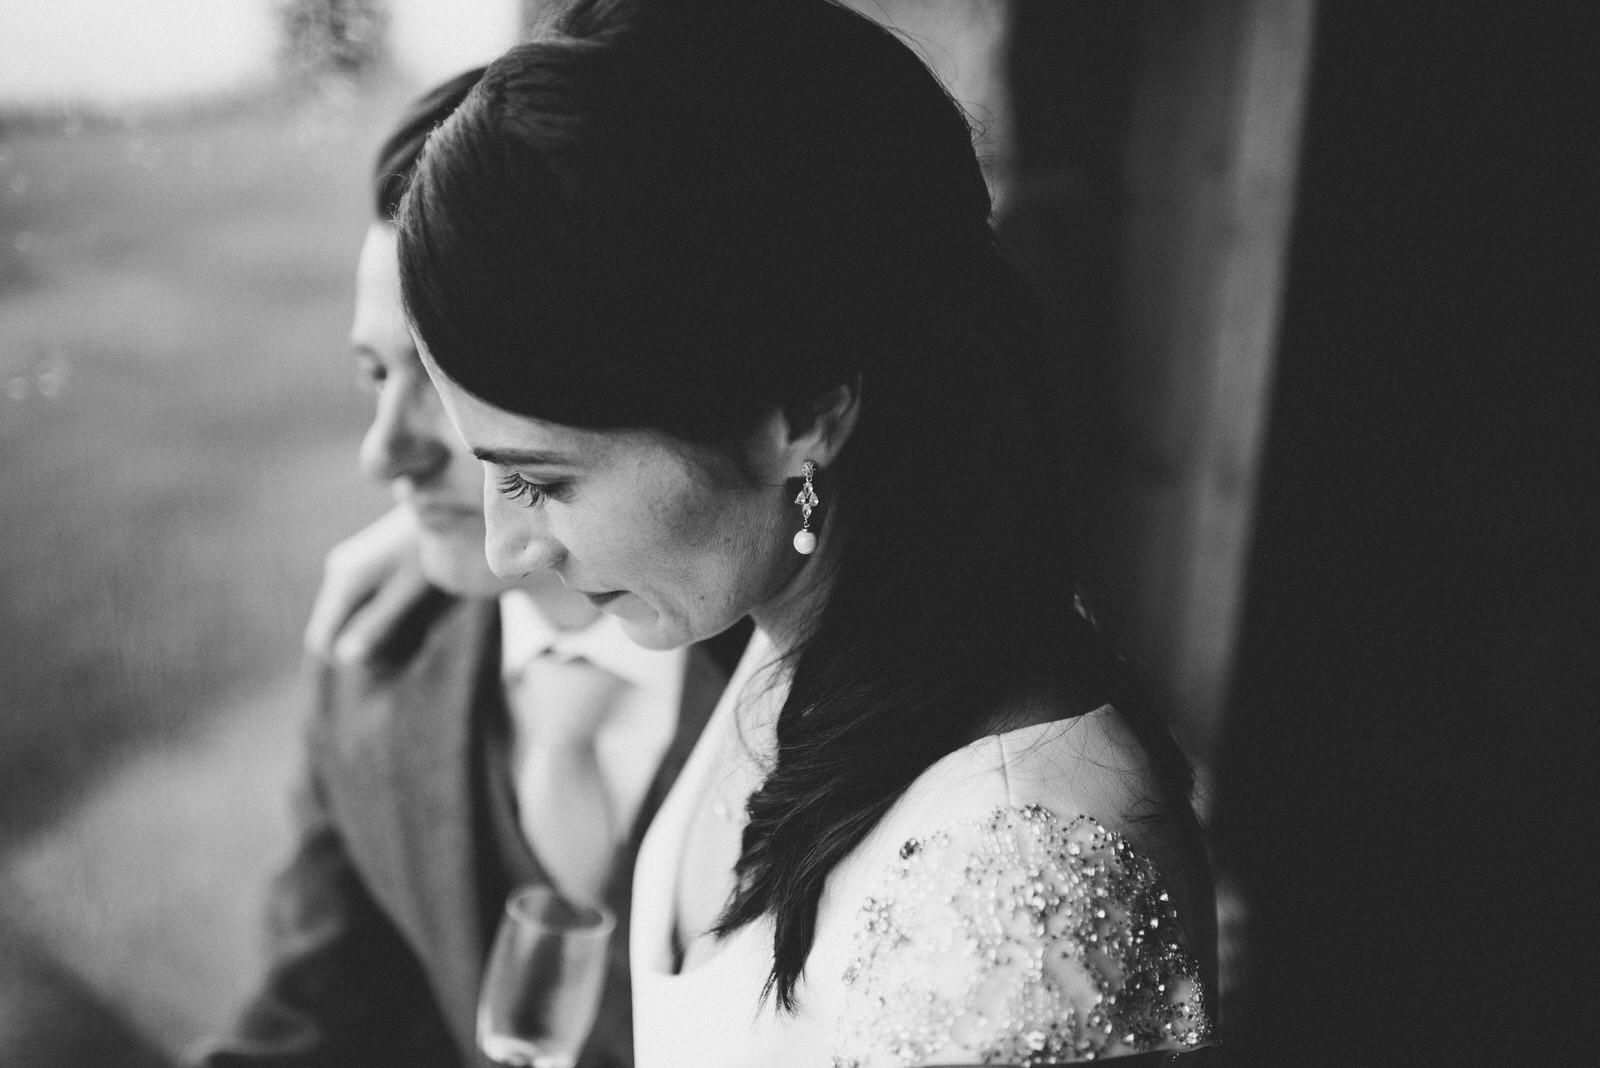 041-GUARDSWELL-FARM-WEDDING-ALTERNATIVE-SCOTTISH-WEDDING-PHOTOGRAPHER-SCOTTISH-WEDDING-DESTINATION-WEDDING-PHOTOGRAPHER.JPG